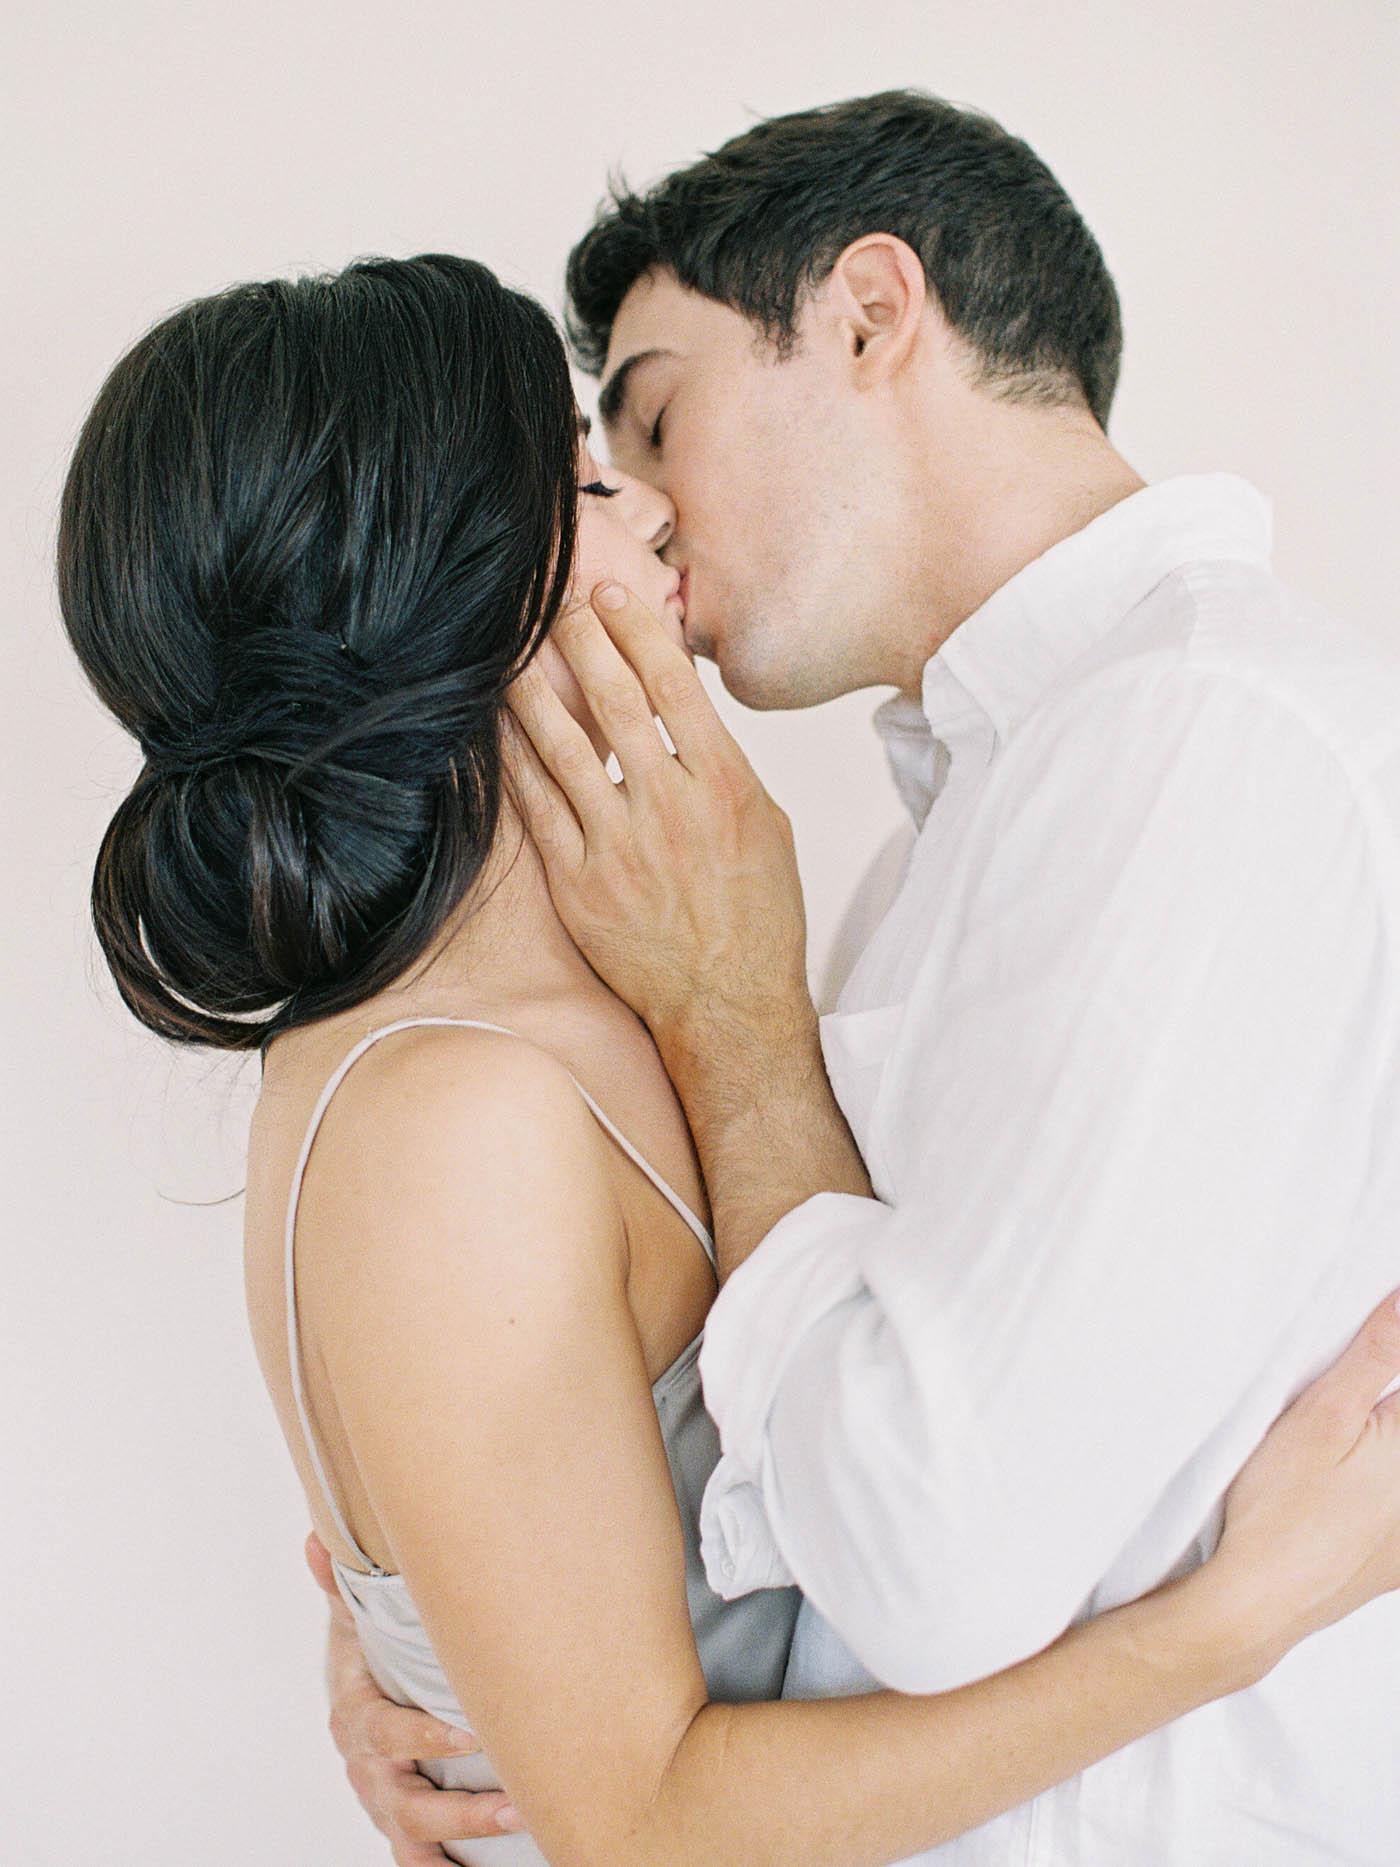 Natural-Engagement-12-Jen_Huang-008122-R1-E021.jpg